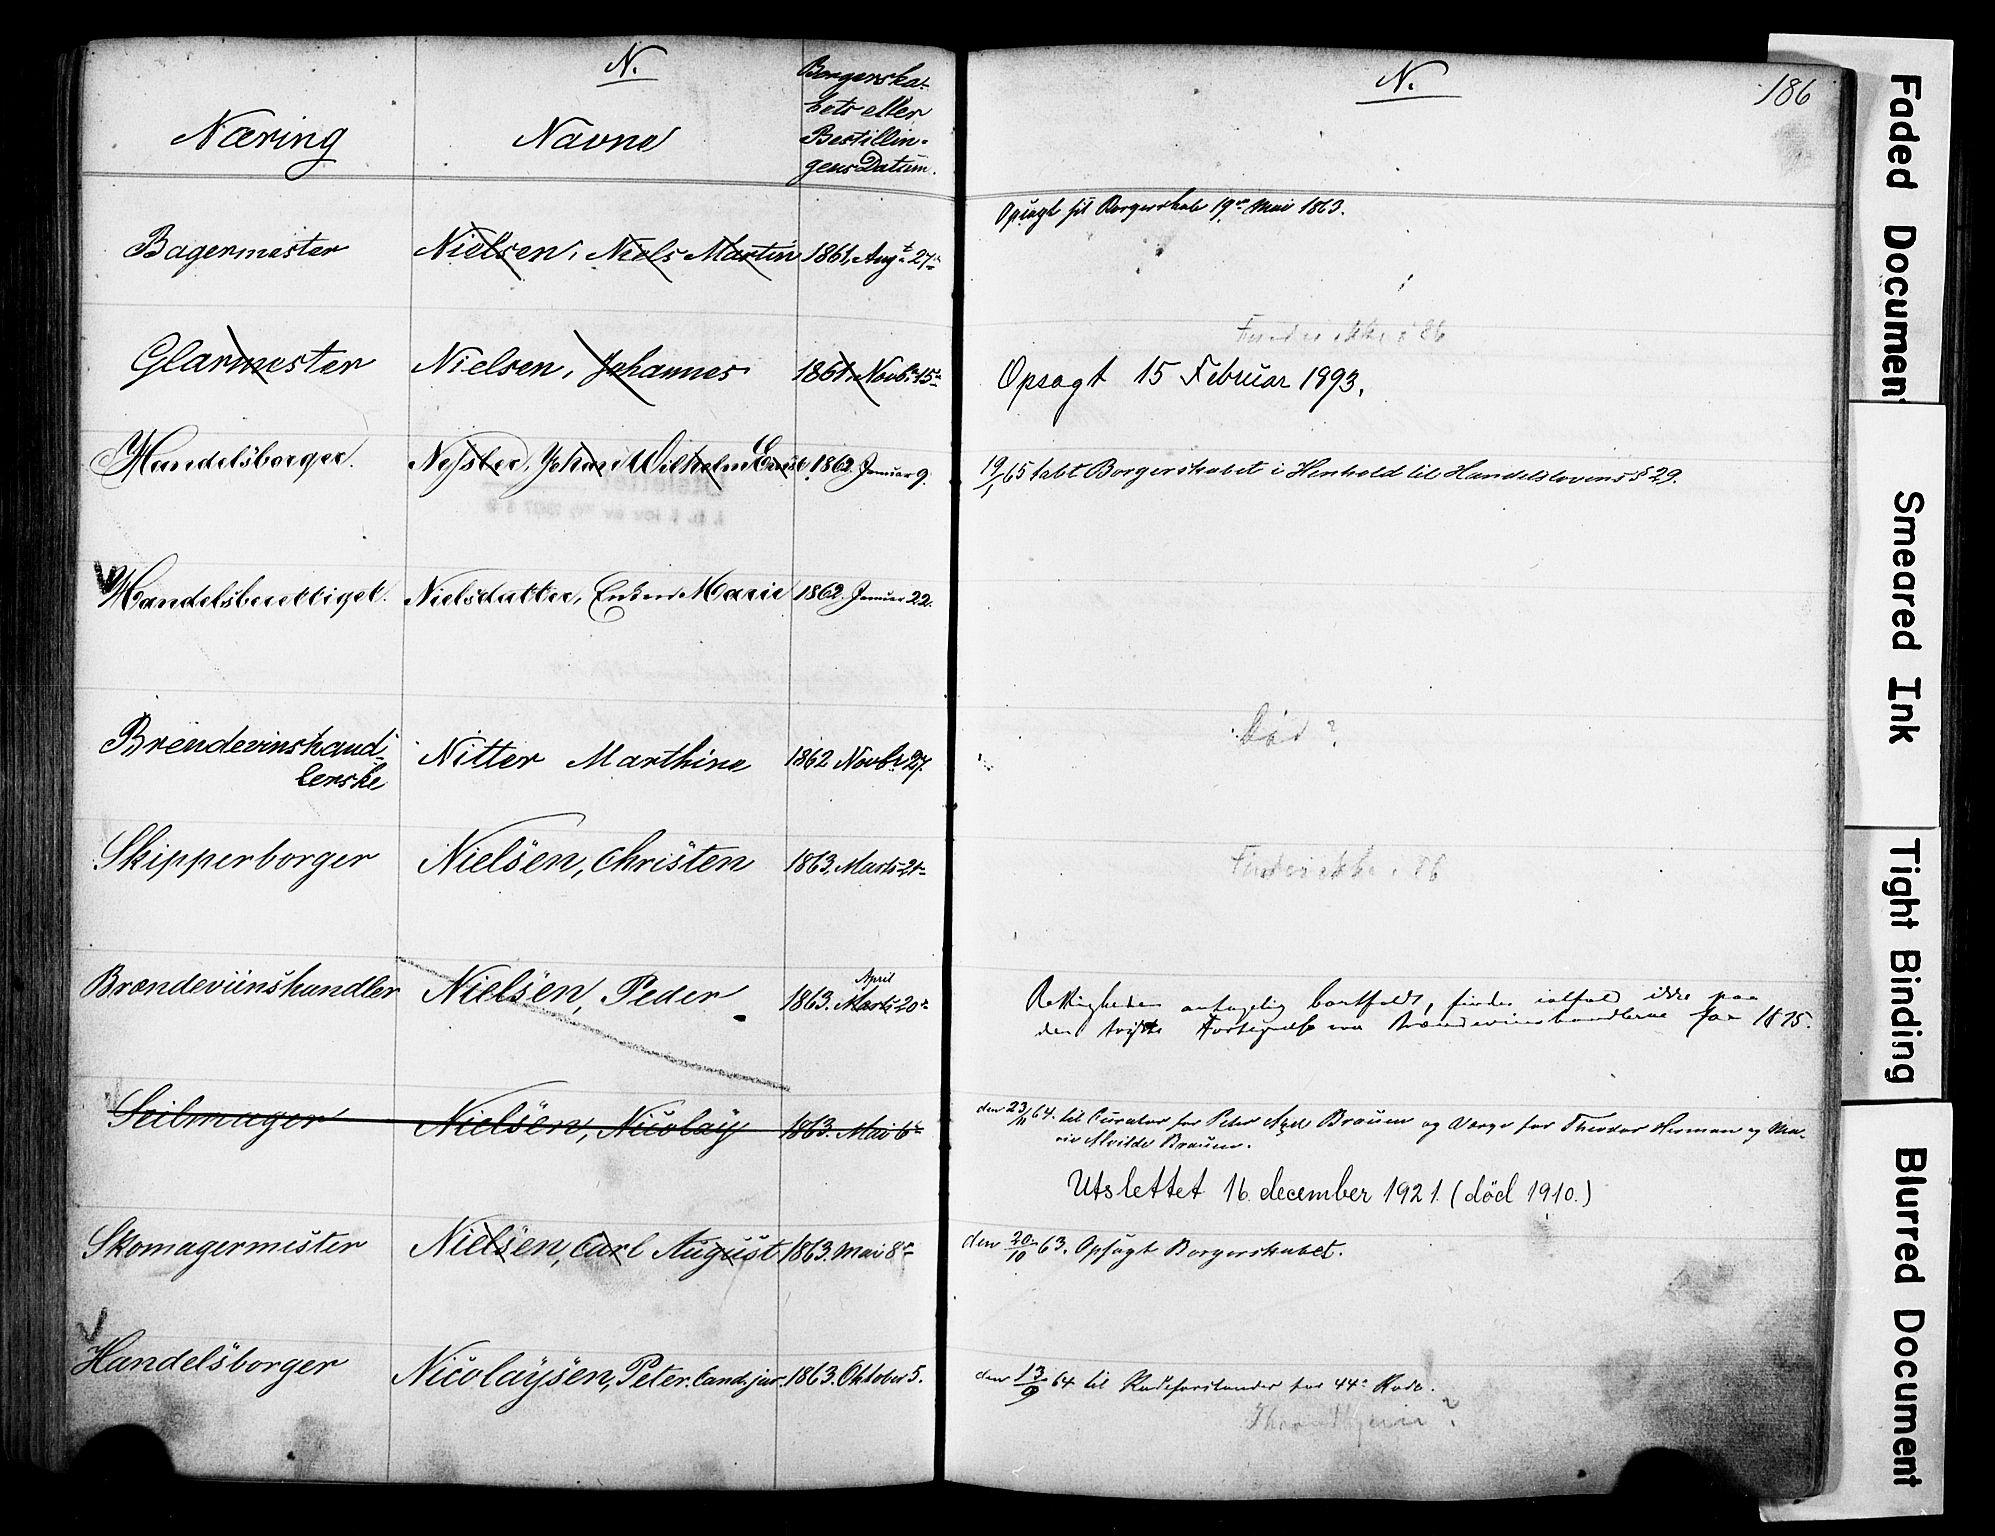 SAO, Kristiania magistrat, F/Fb/L0004: Borgerrulle, 1860-1879, s. 188